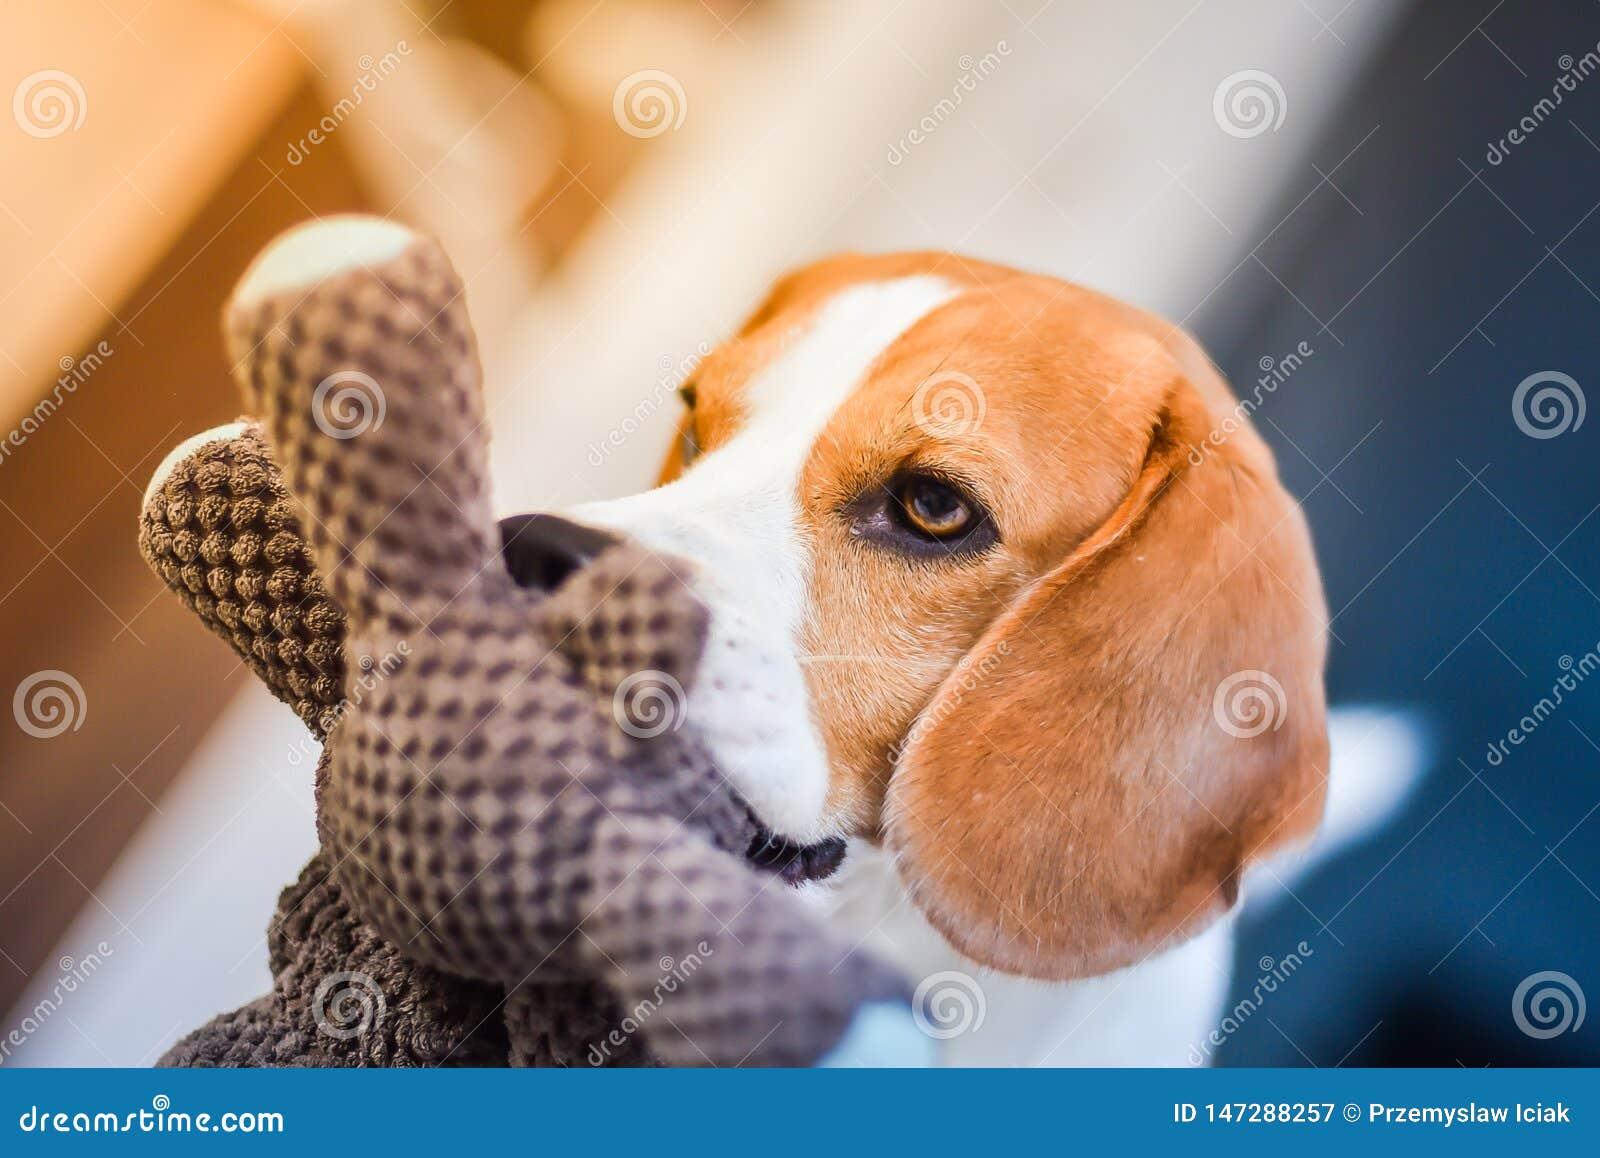 Beaglehund med en favorit- leksak i mun inomhus